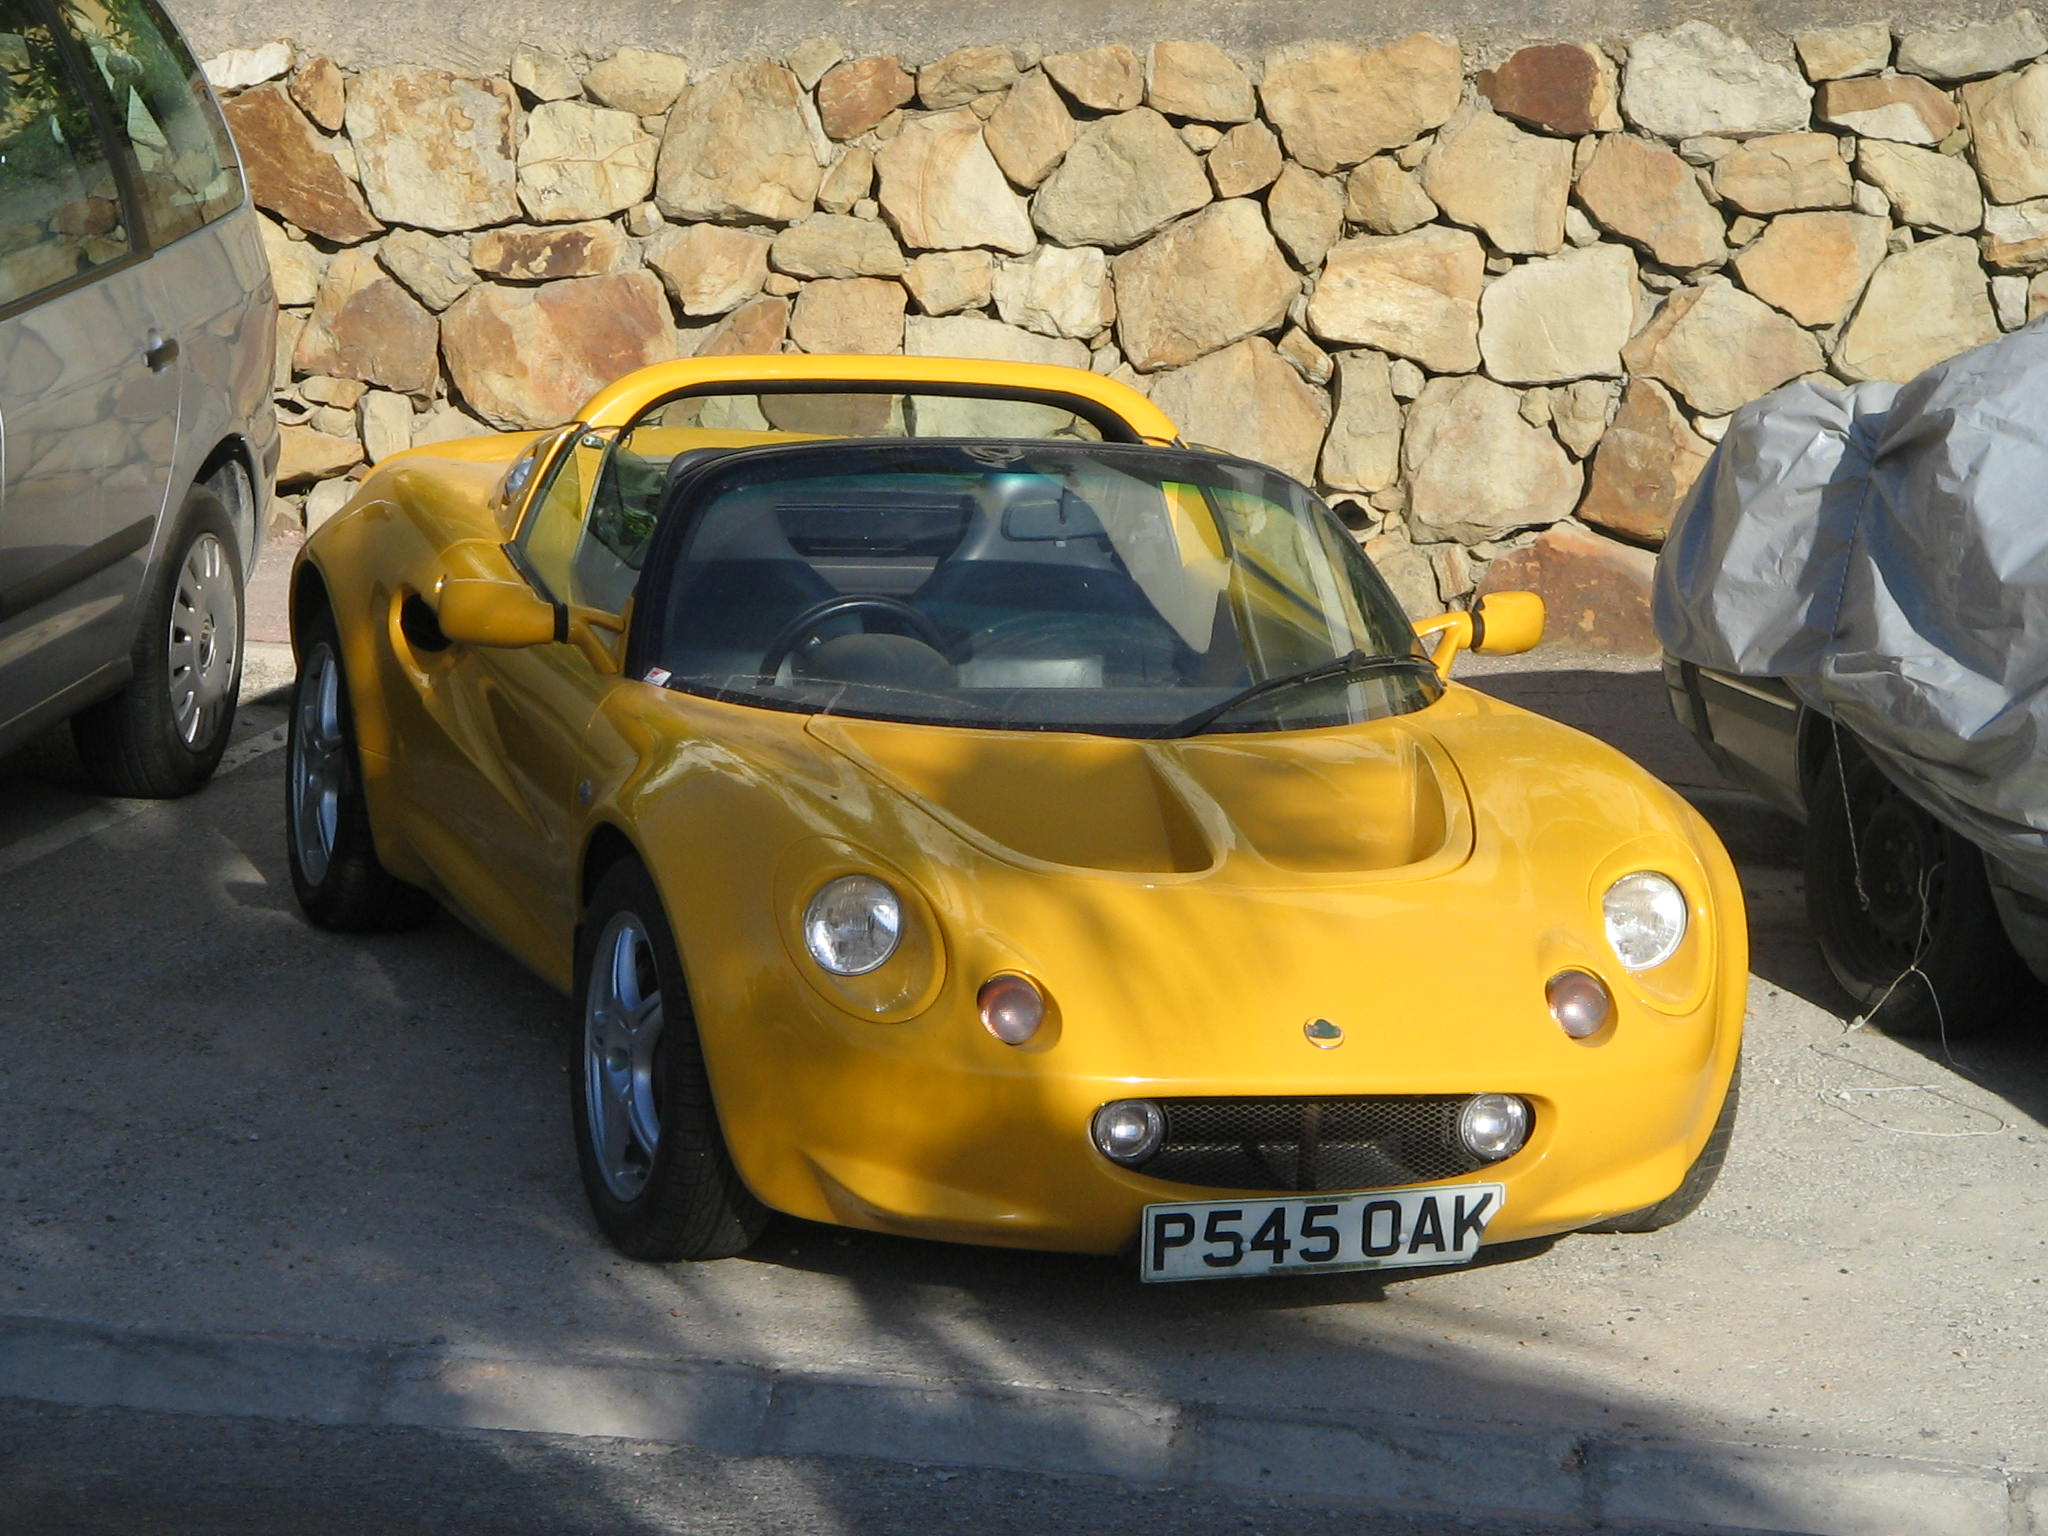 File:Lotus Elise S1.jpg - Wikimedia Commons